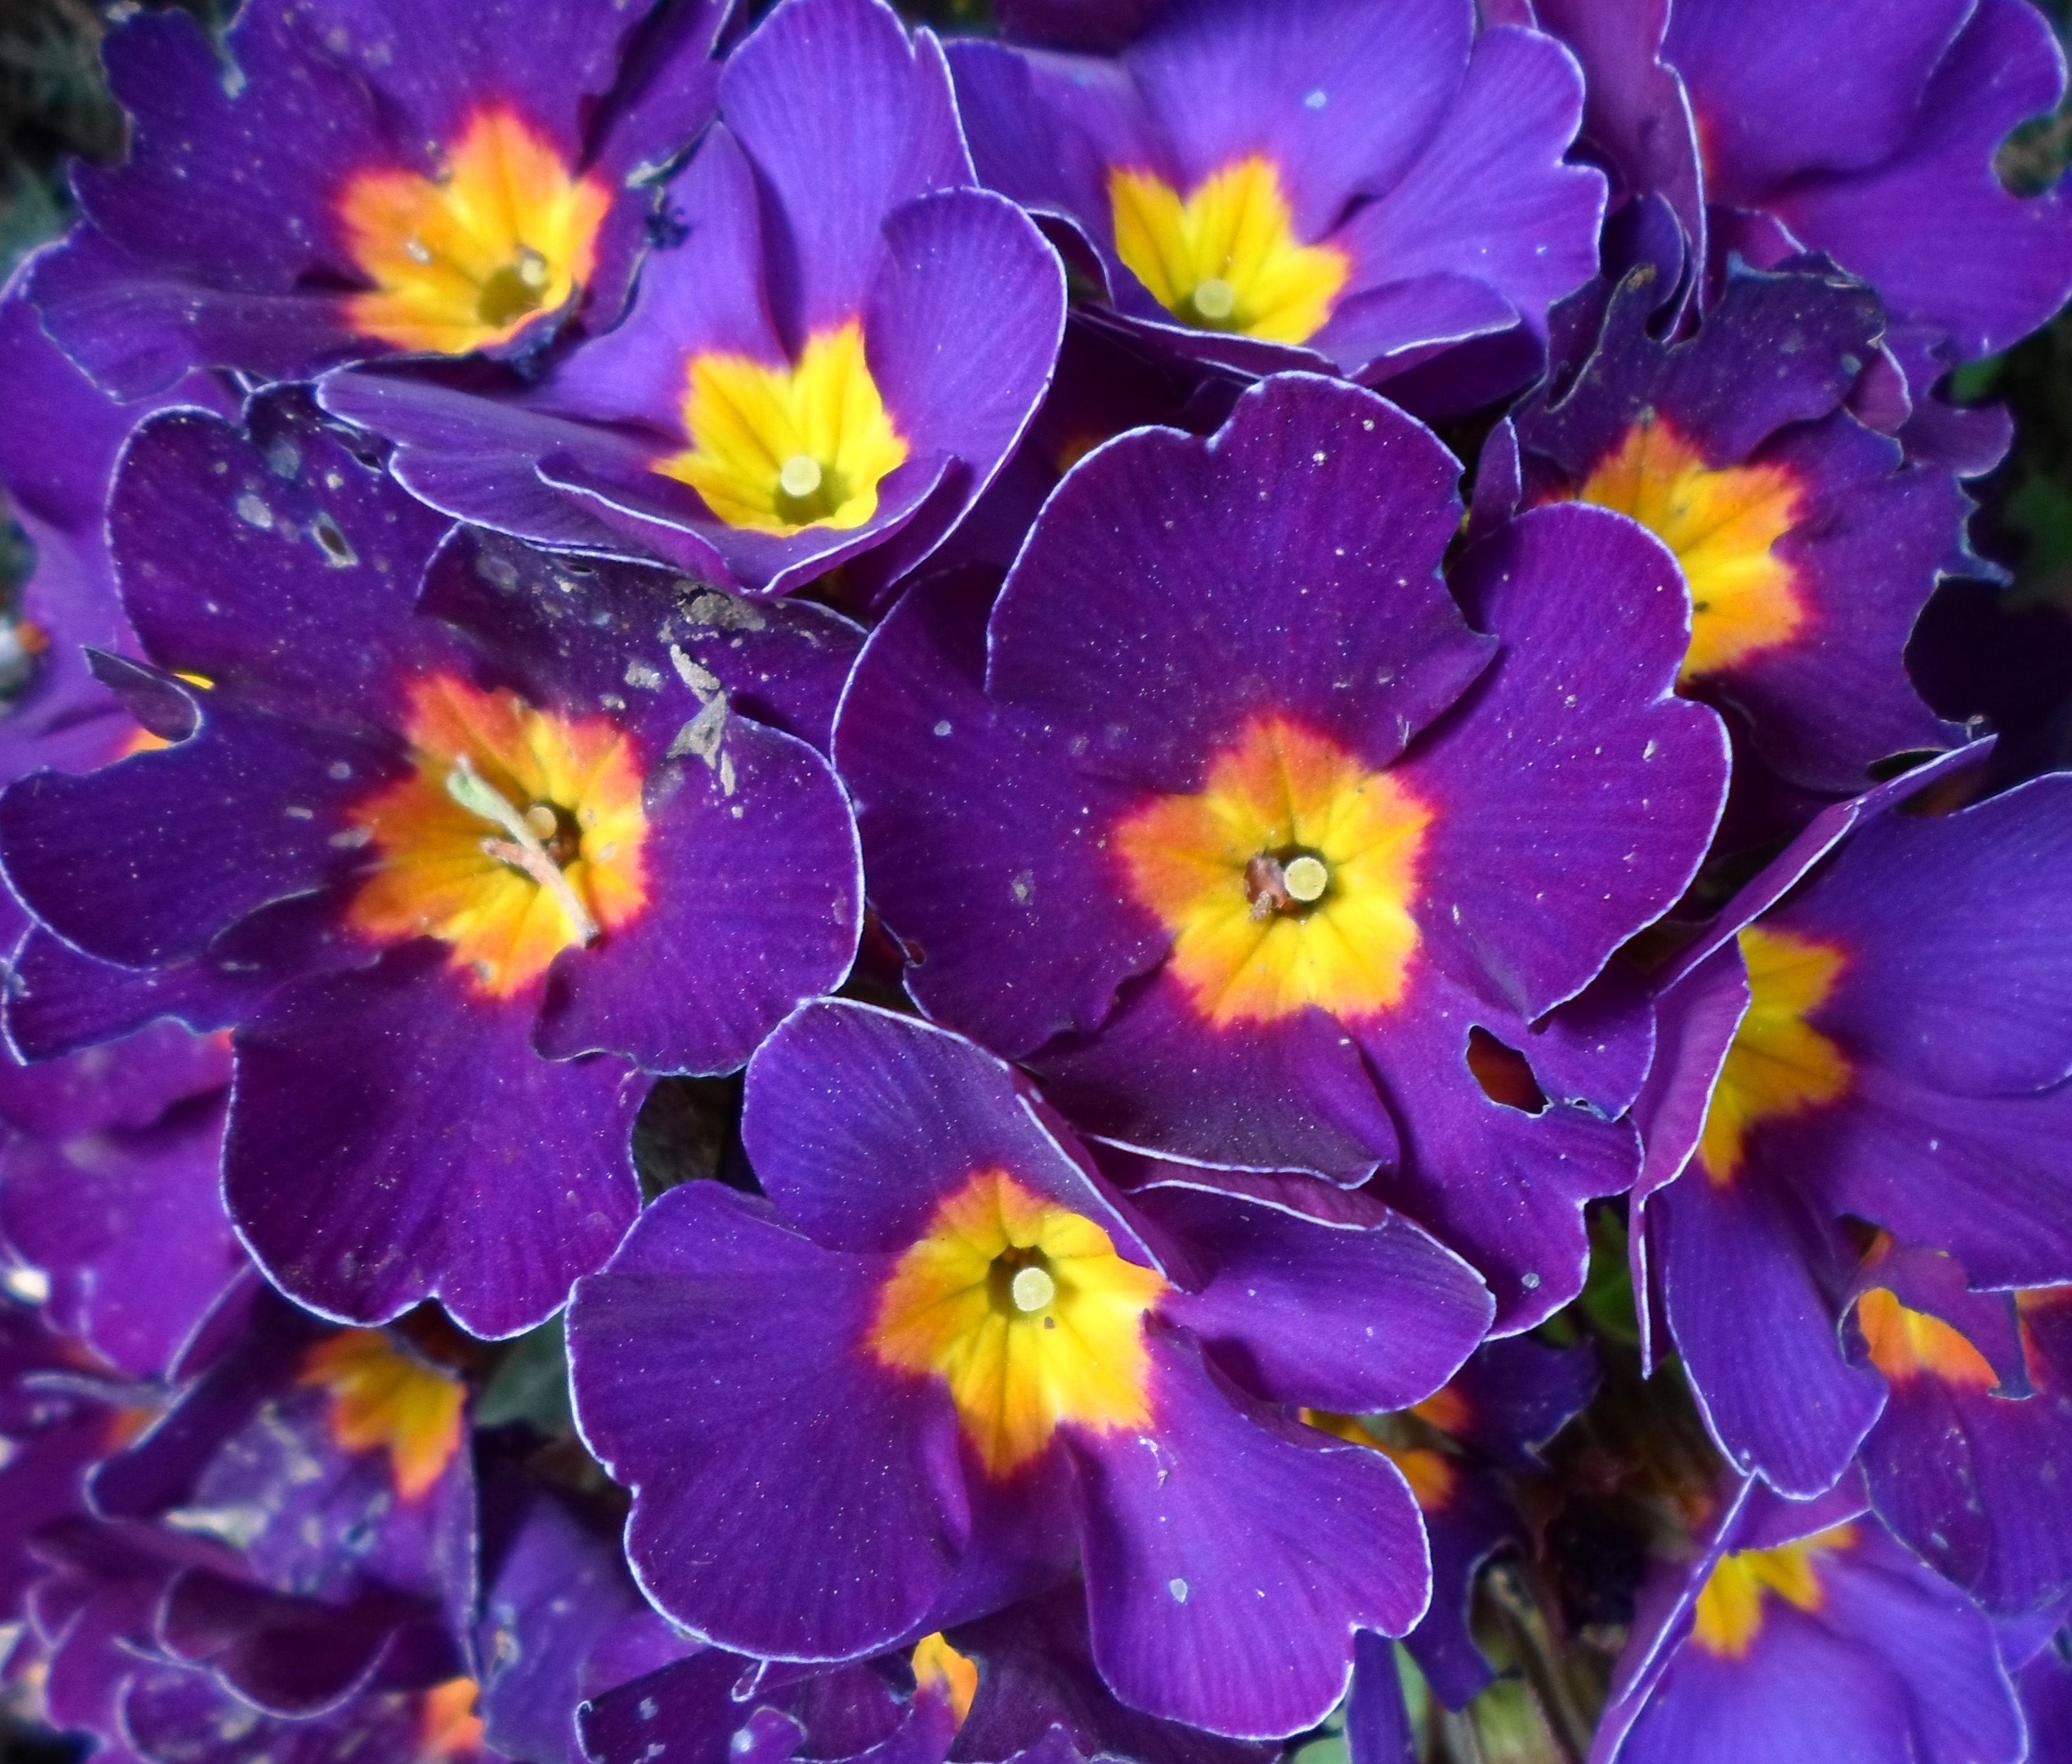 Purple and Yellow Flowers | Vulnicura Love. | Pinterest ...